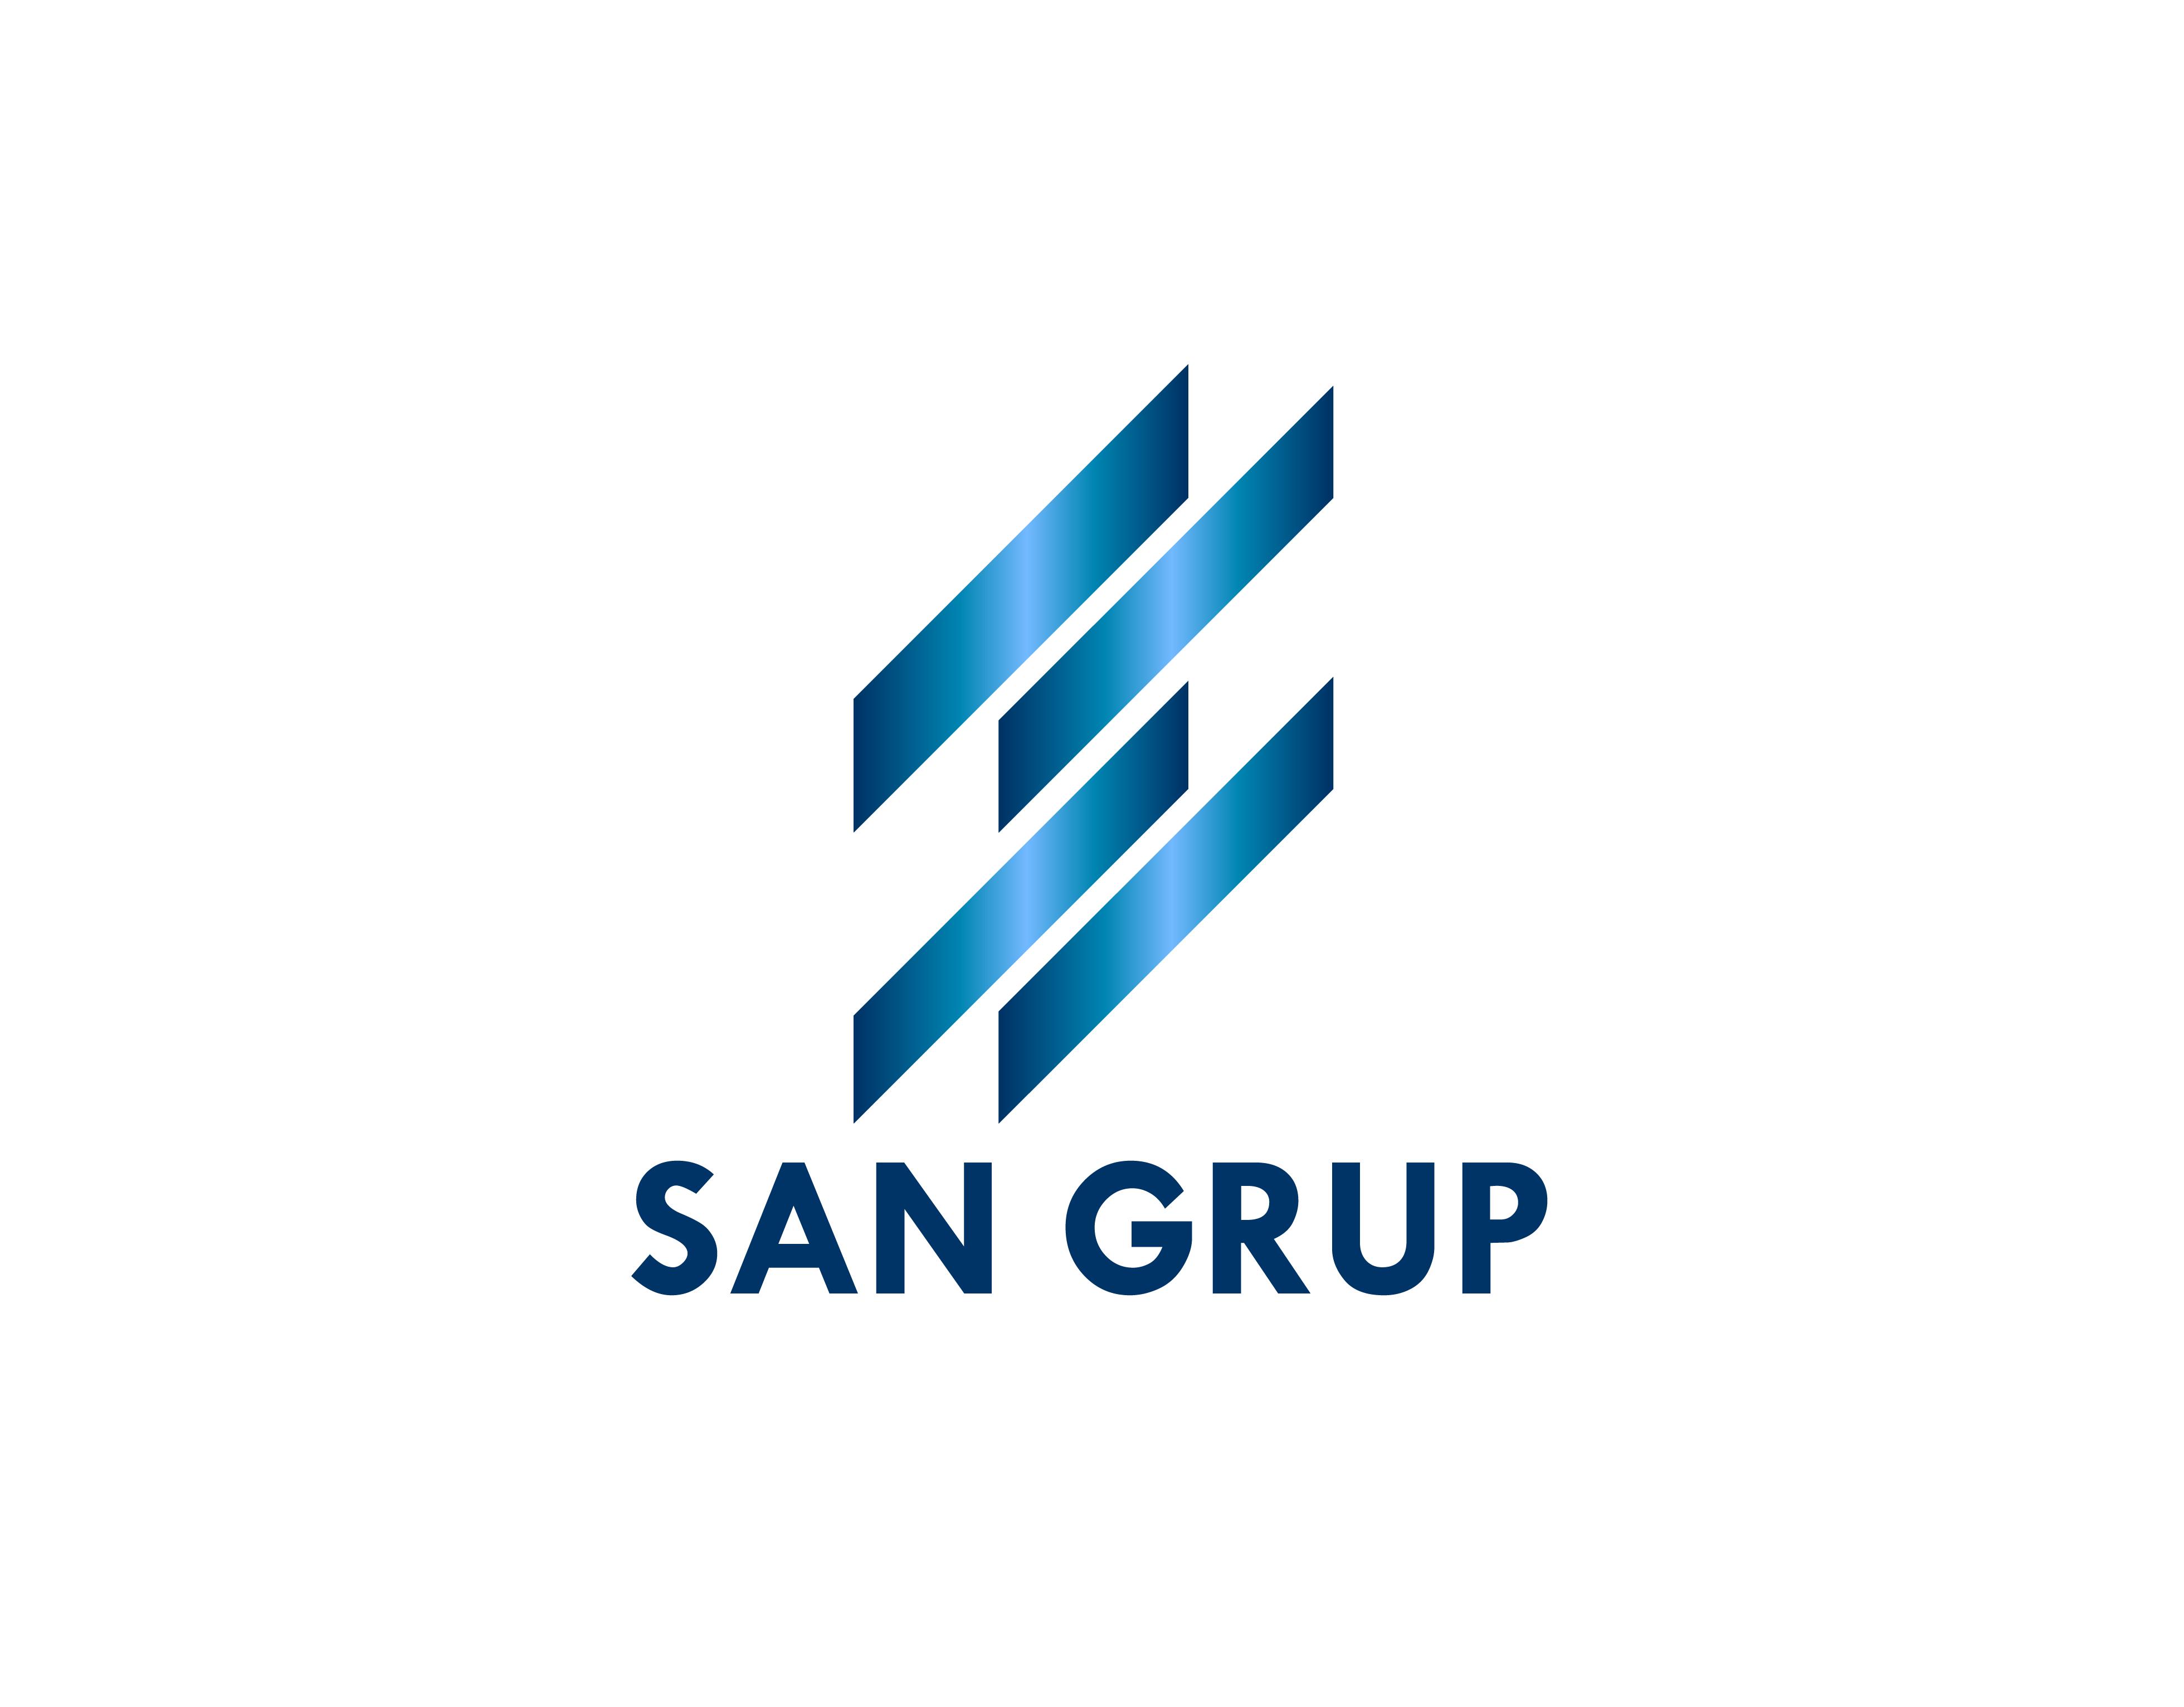 San Grup